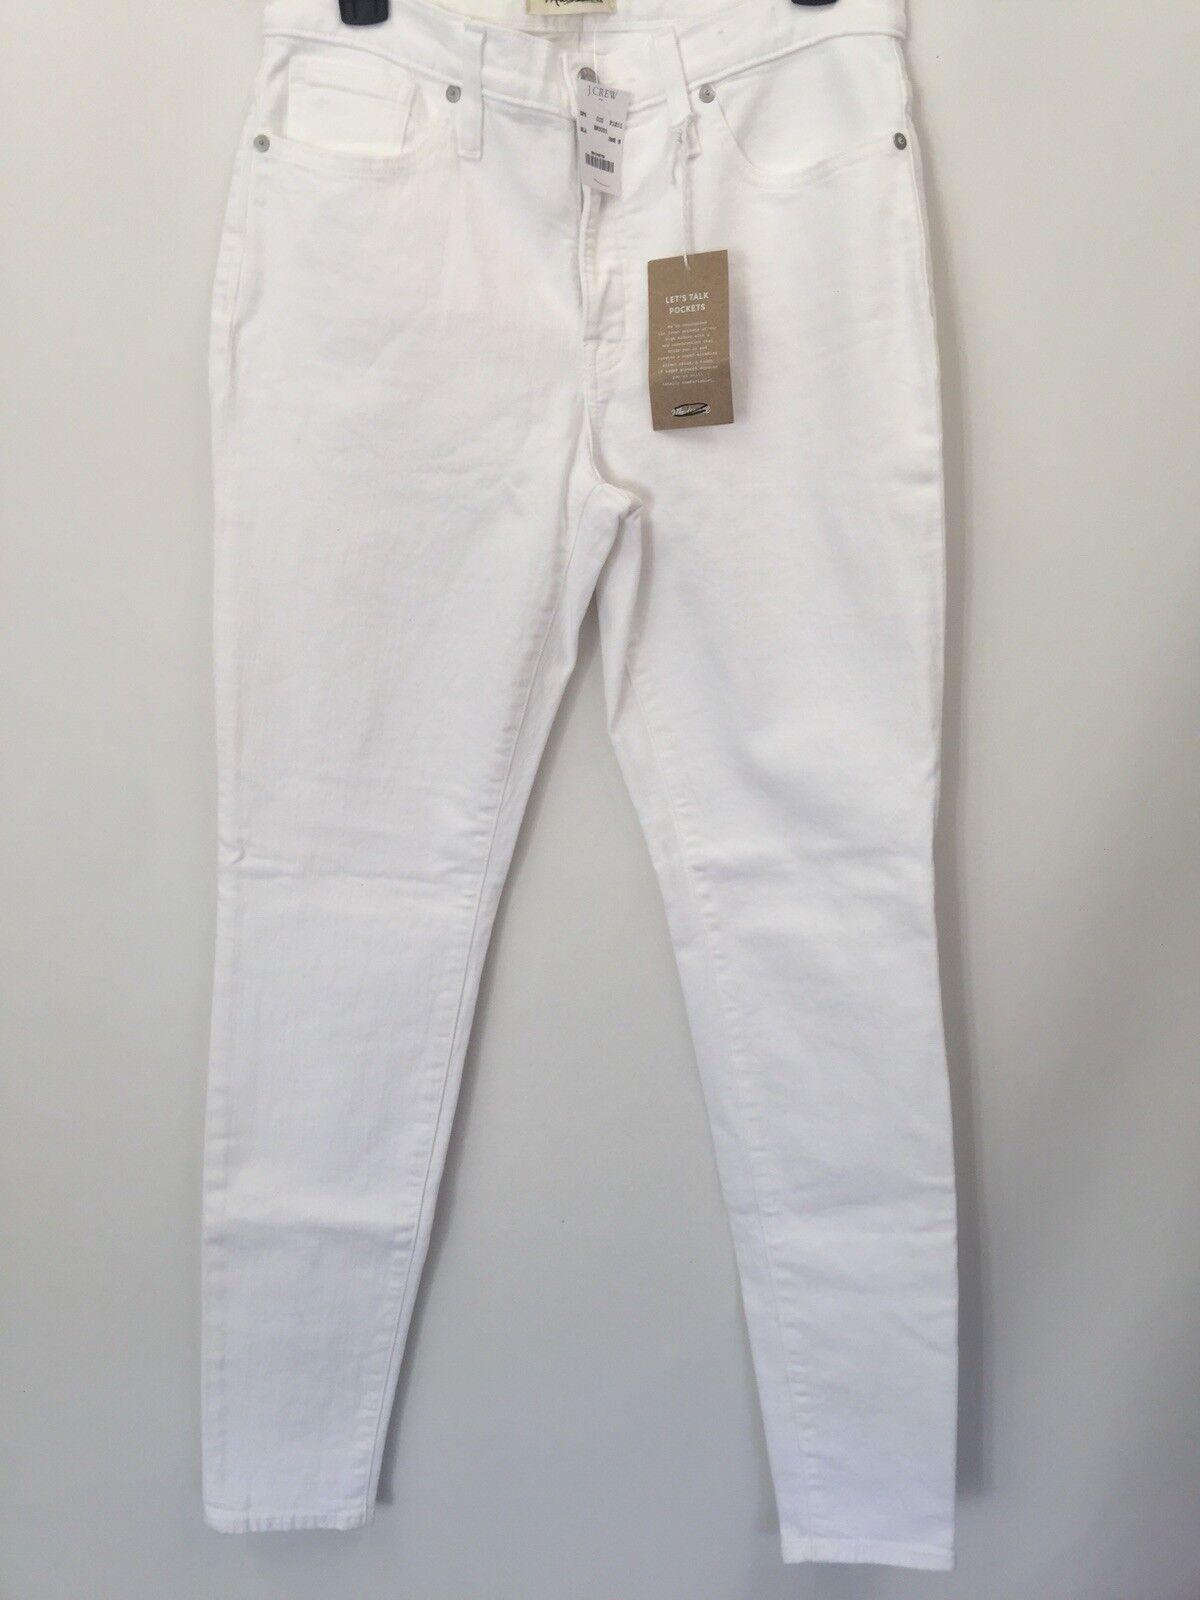 "Madewell Tall 9"" Jean Filiforme Größe Haute Weiß Pur Größe 30 T H5876  128"